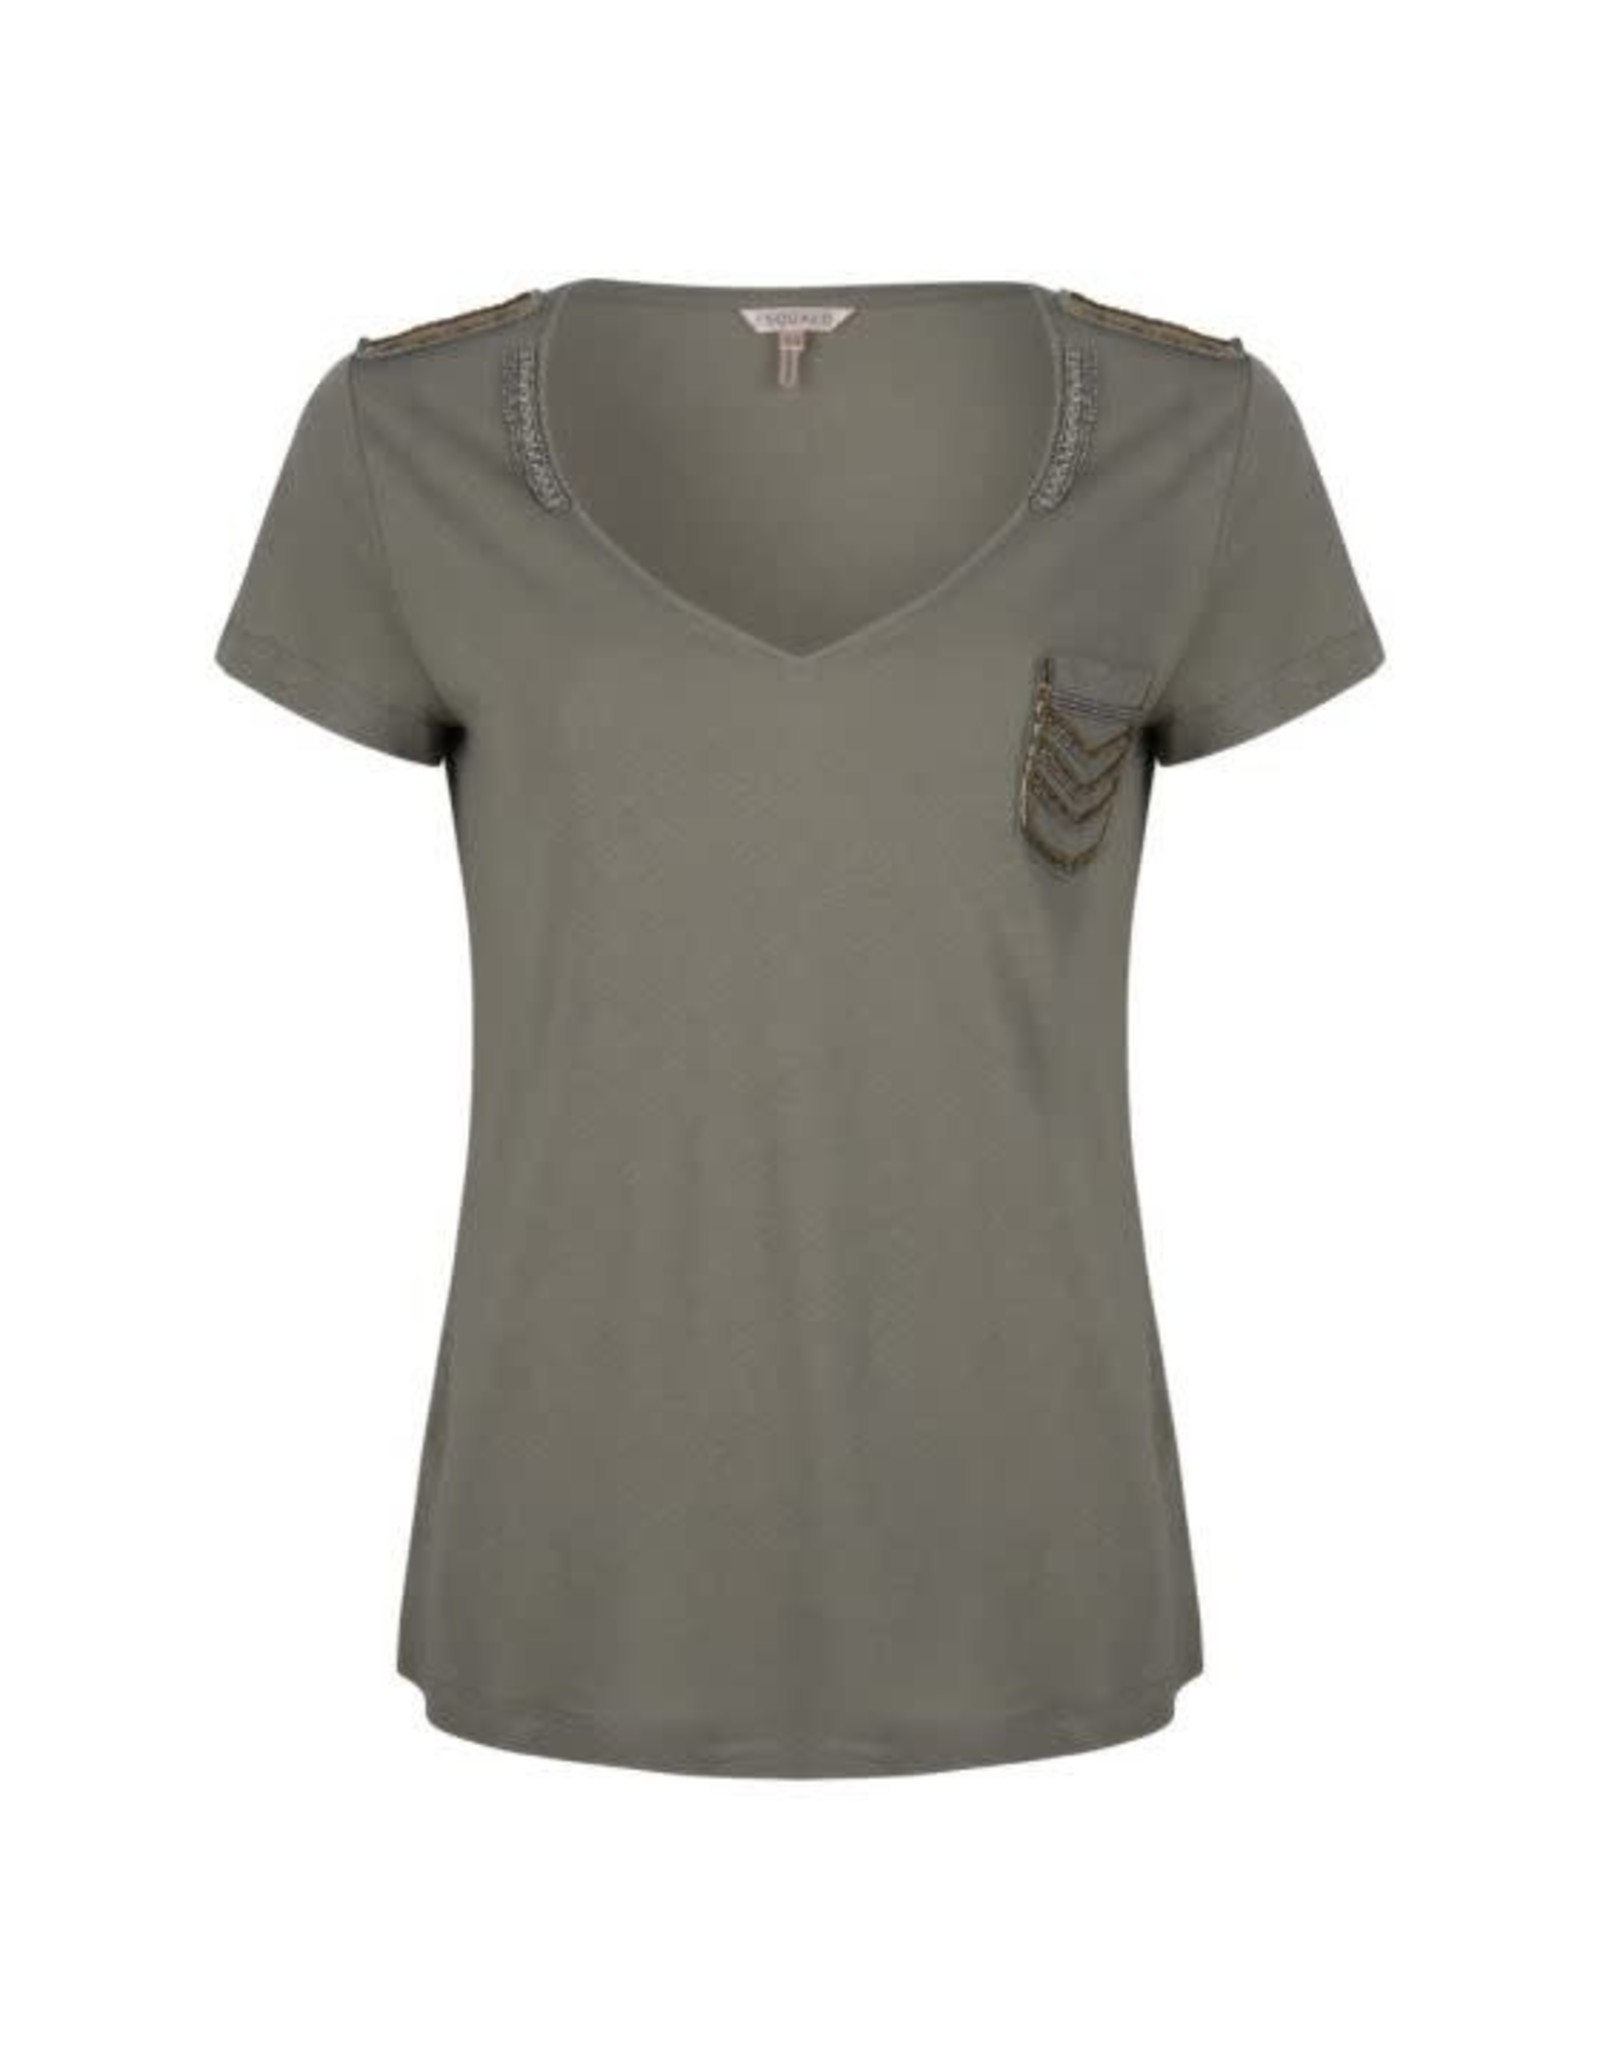 Esqualo Military Patches T-Shirt